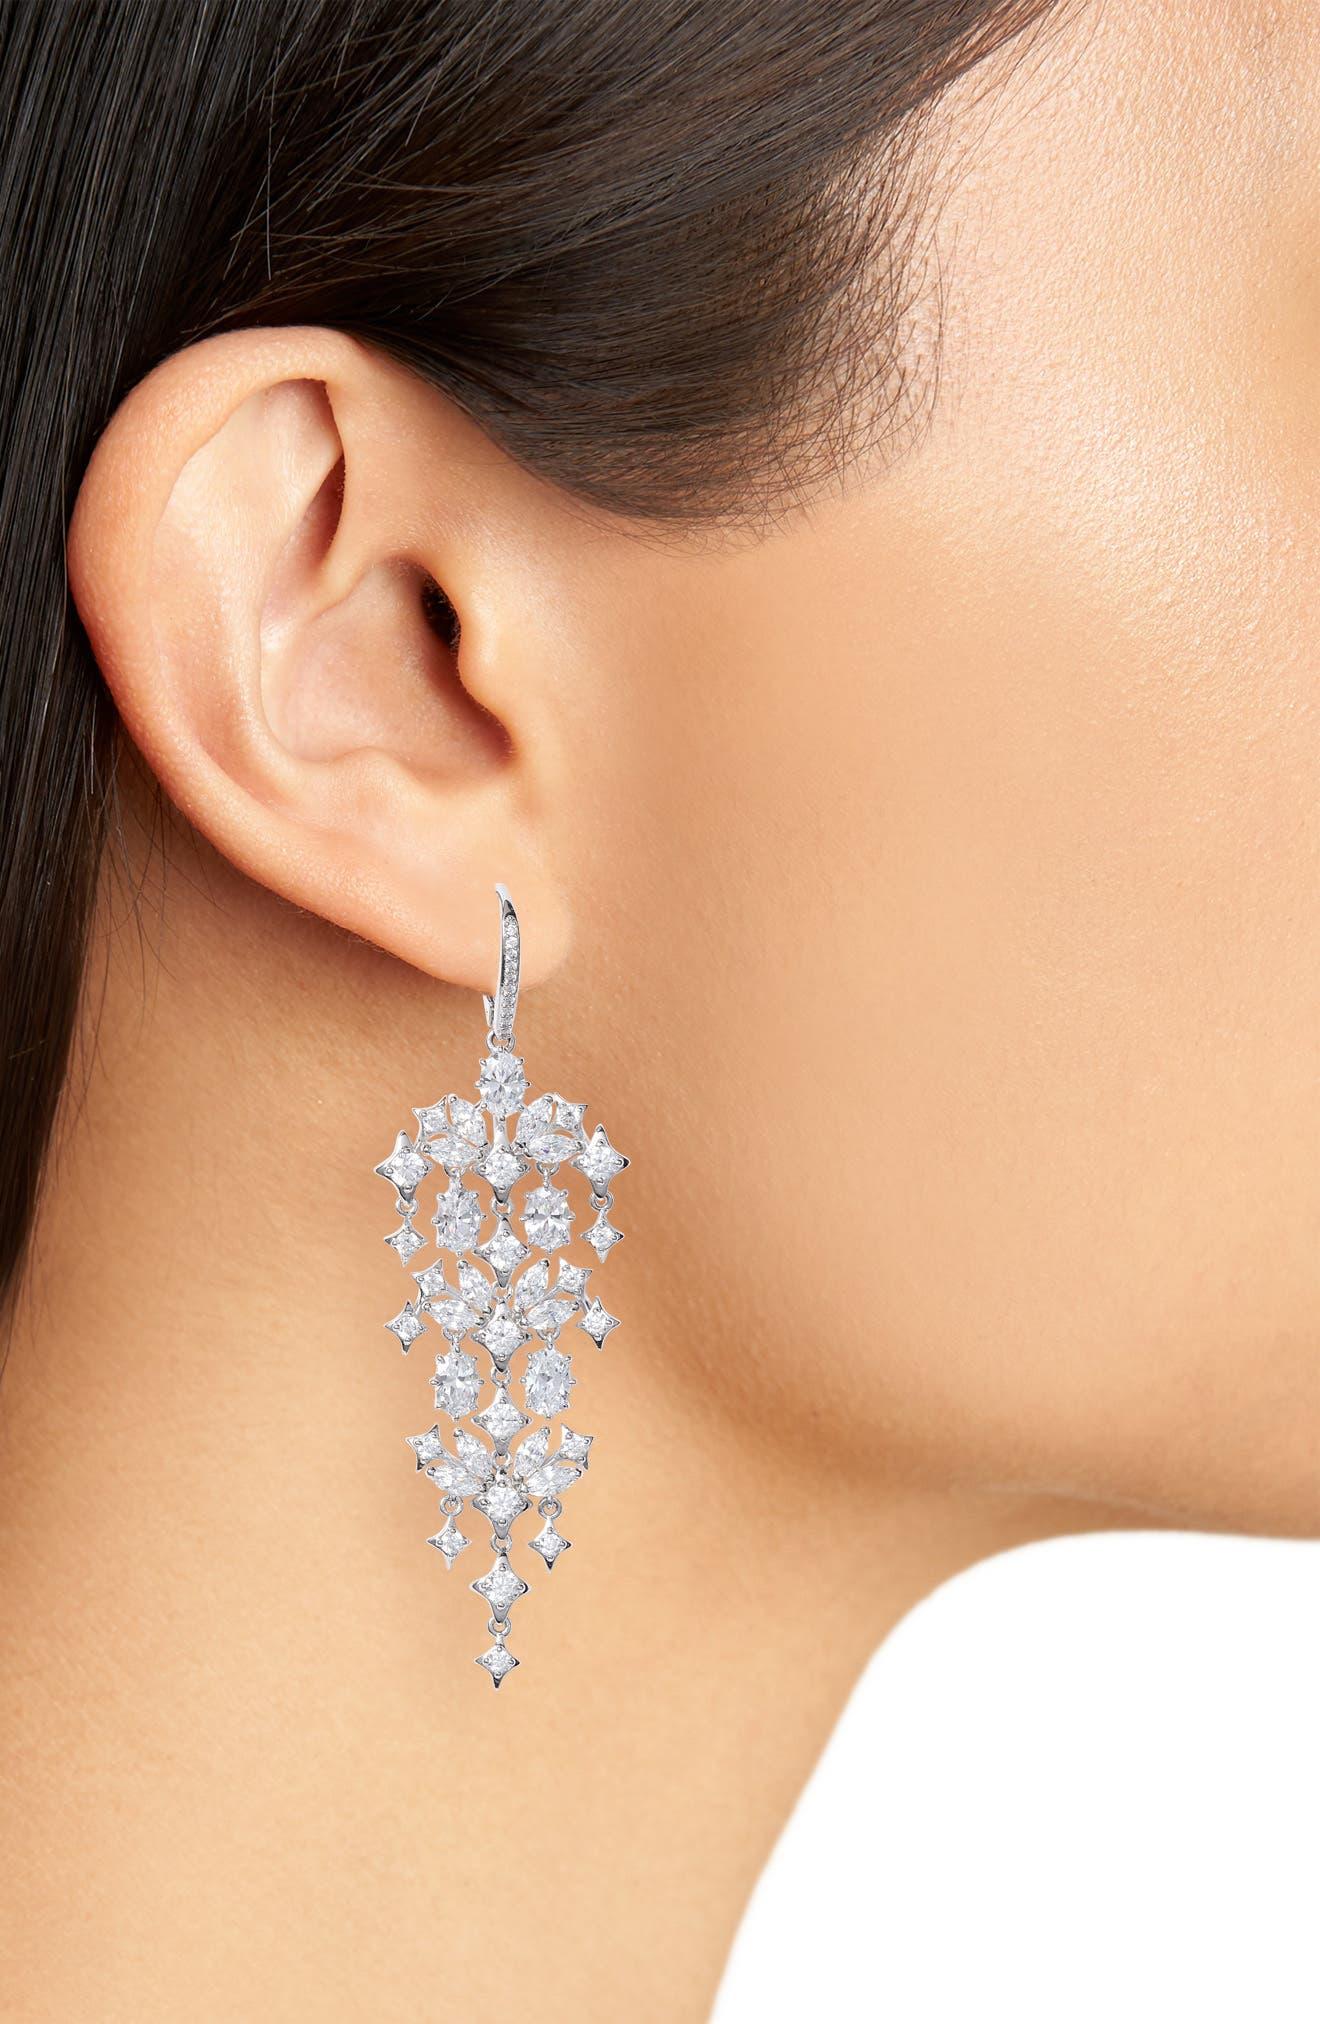 Boho Crystal Chandelier Earrings,                             Alternate thumbnail 2, color,                             Silver/ Clear